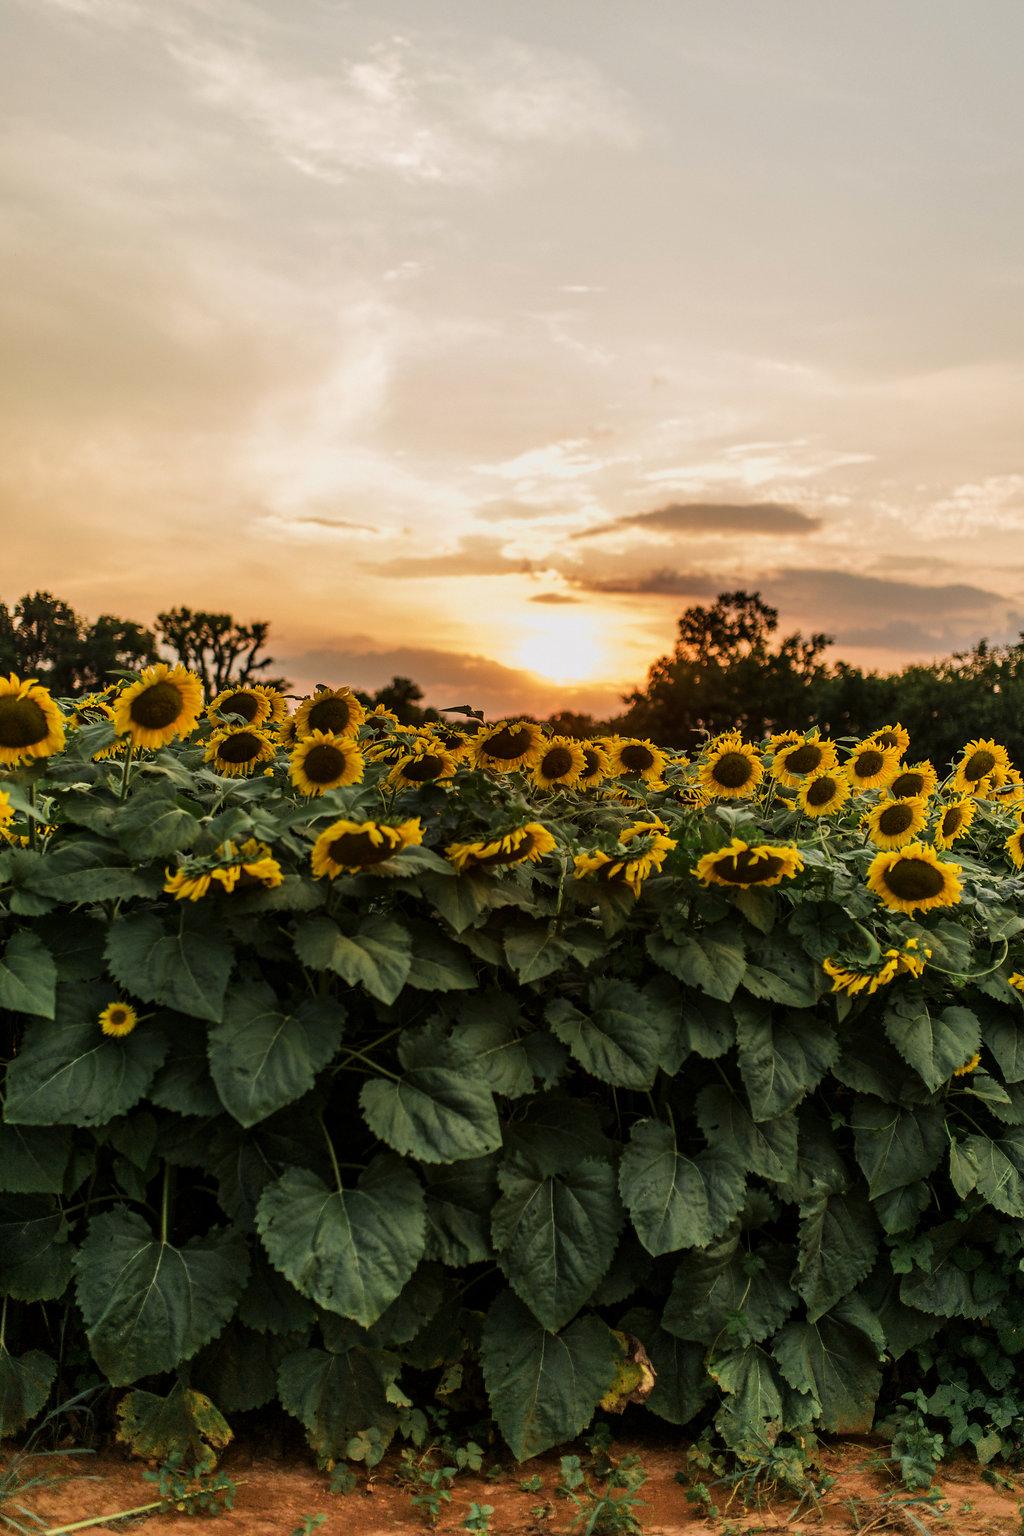 Sunflower-Maternity-Nashville-Tennessee-Field-Batey-Farms-9